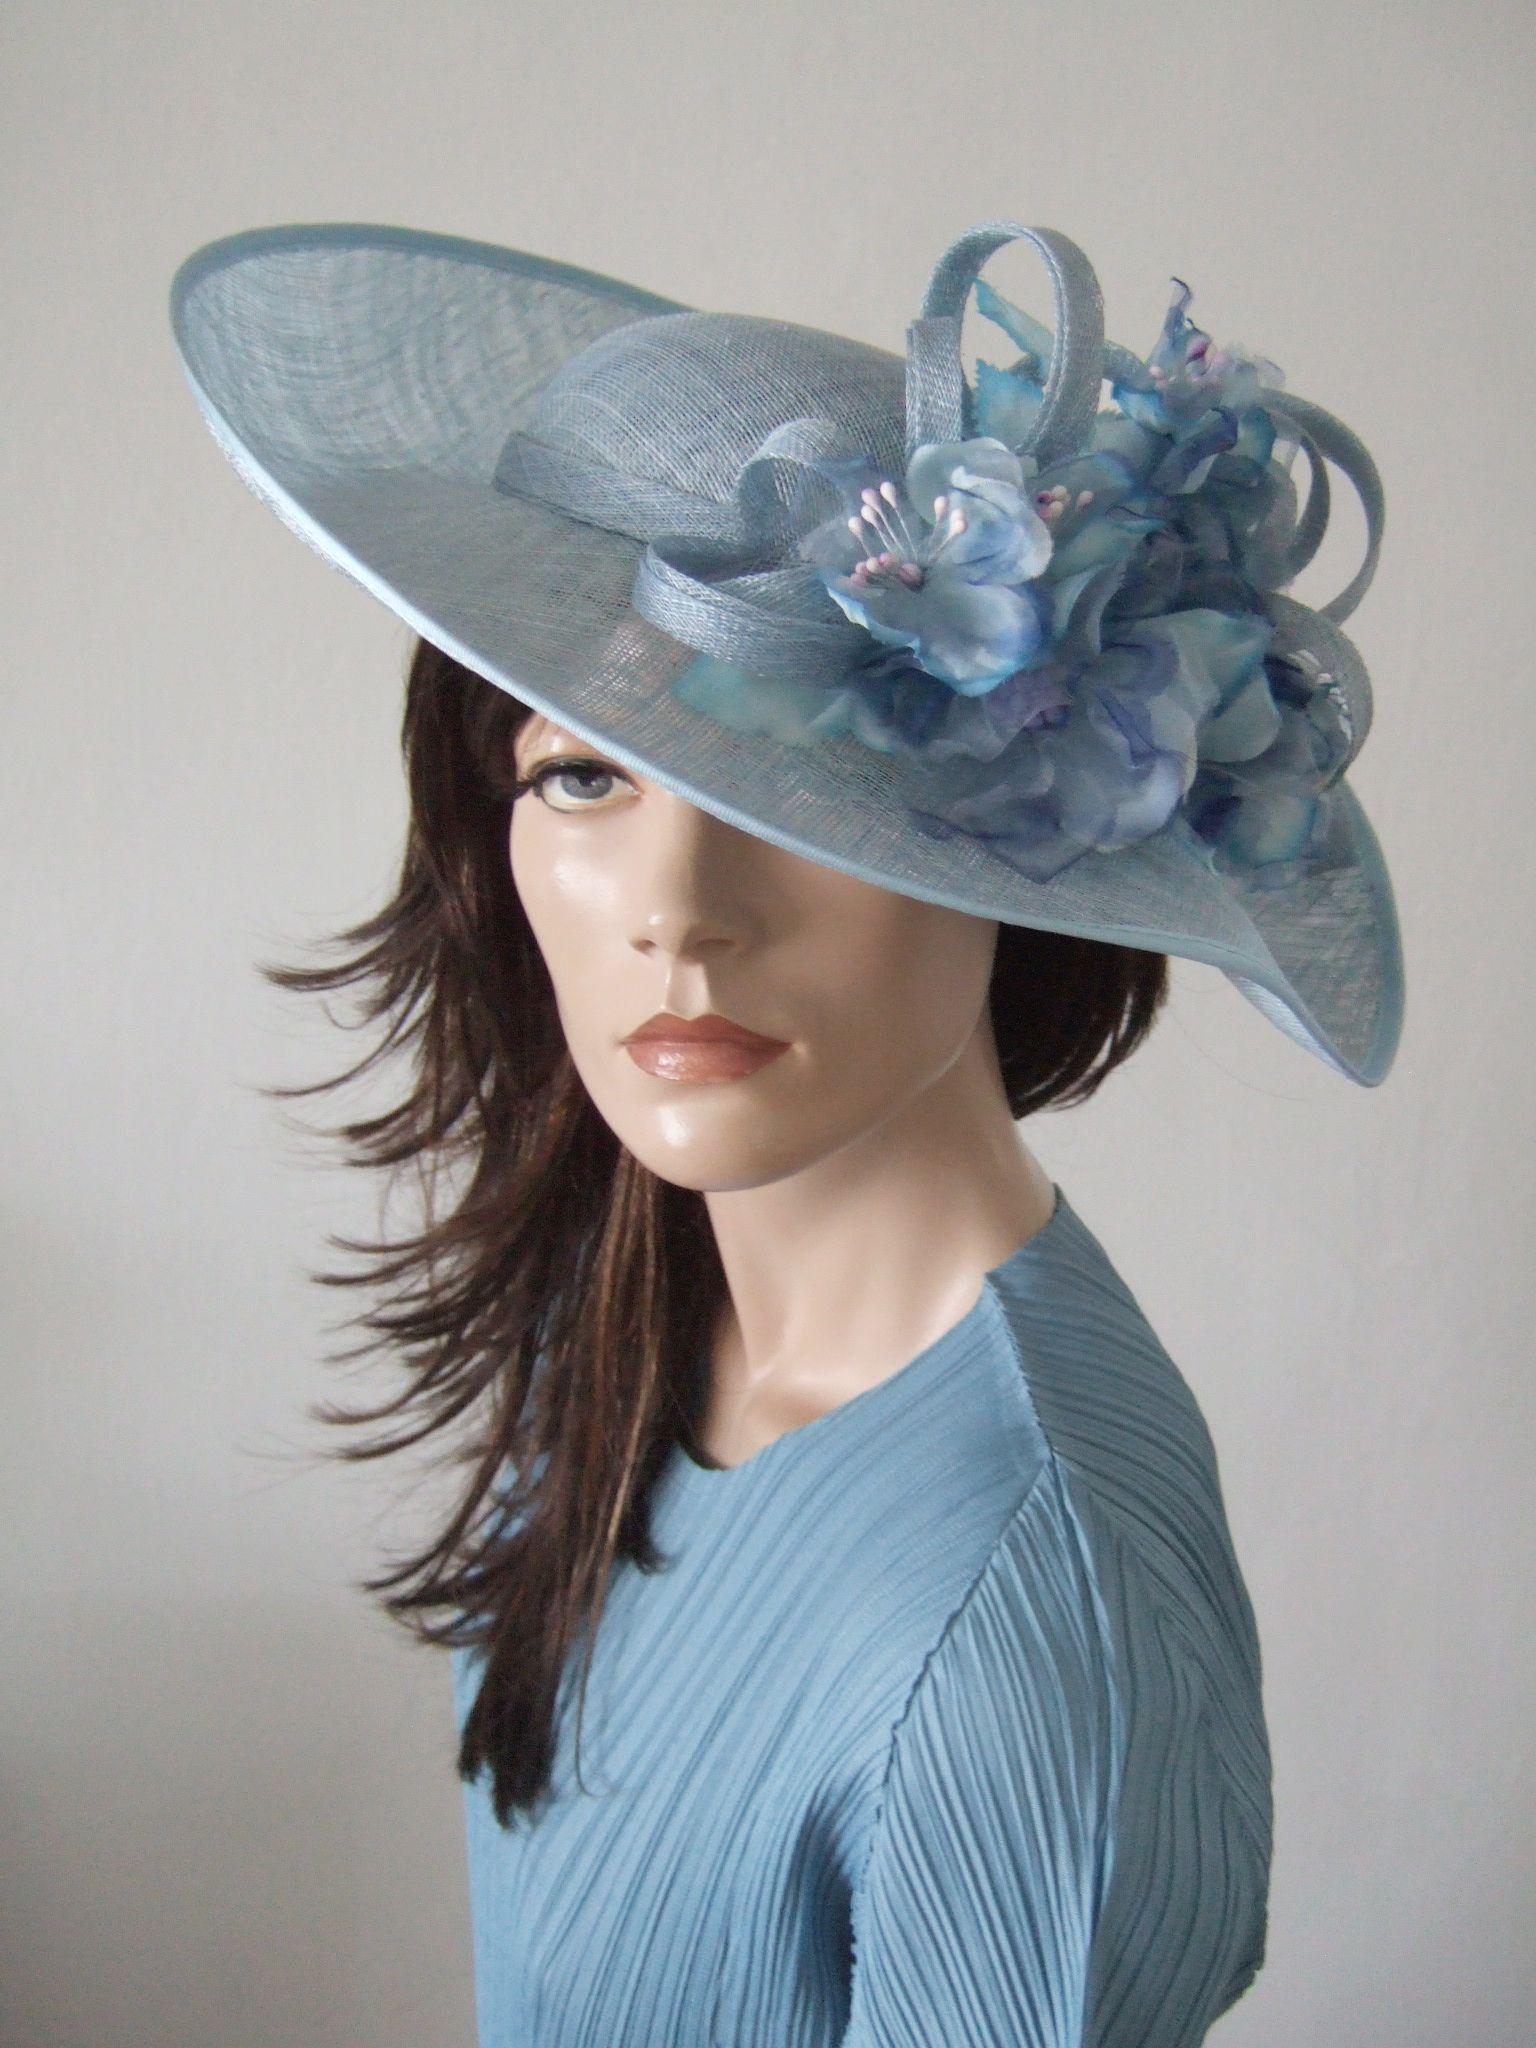 Cornflower Blue Hat From Dress 2 Impress